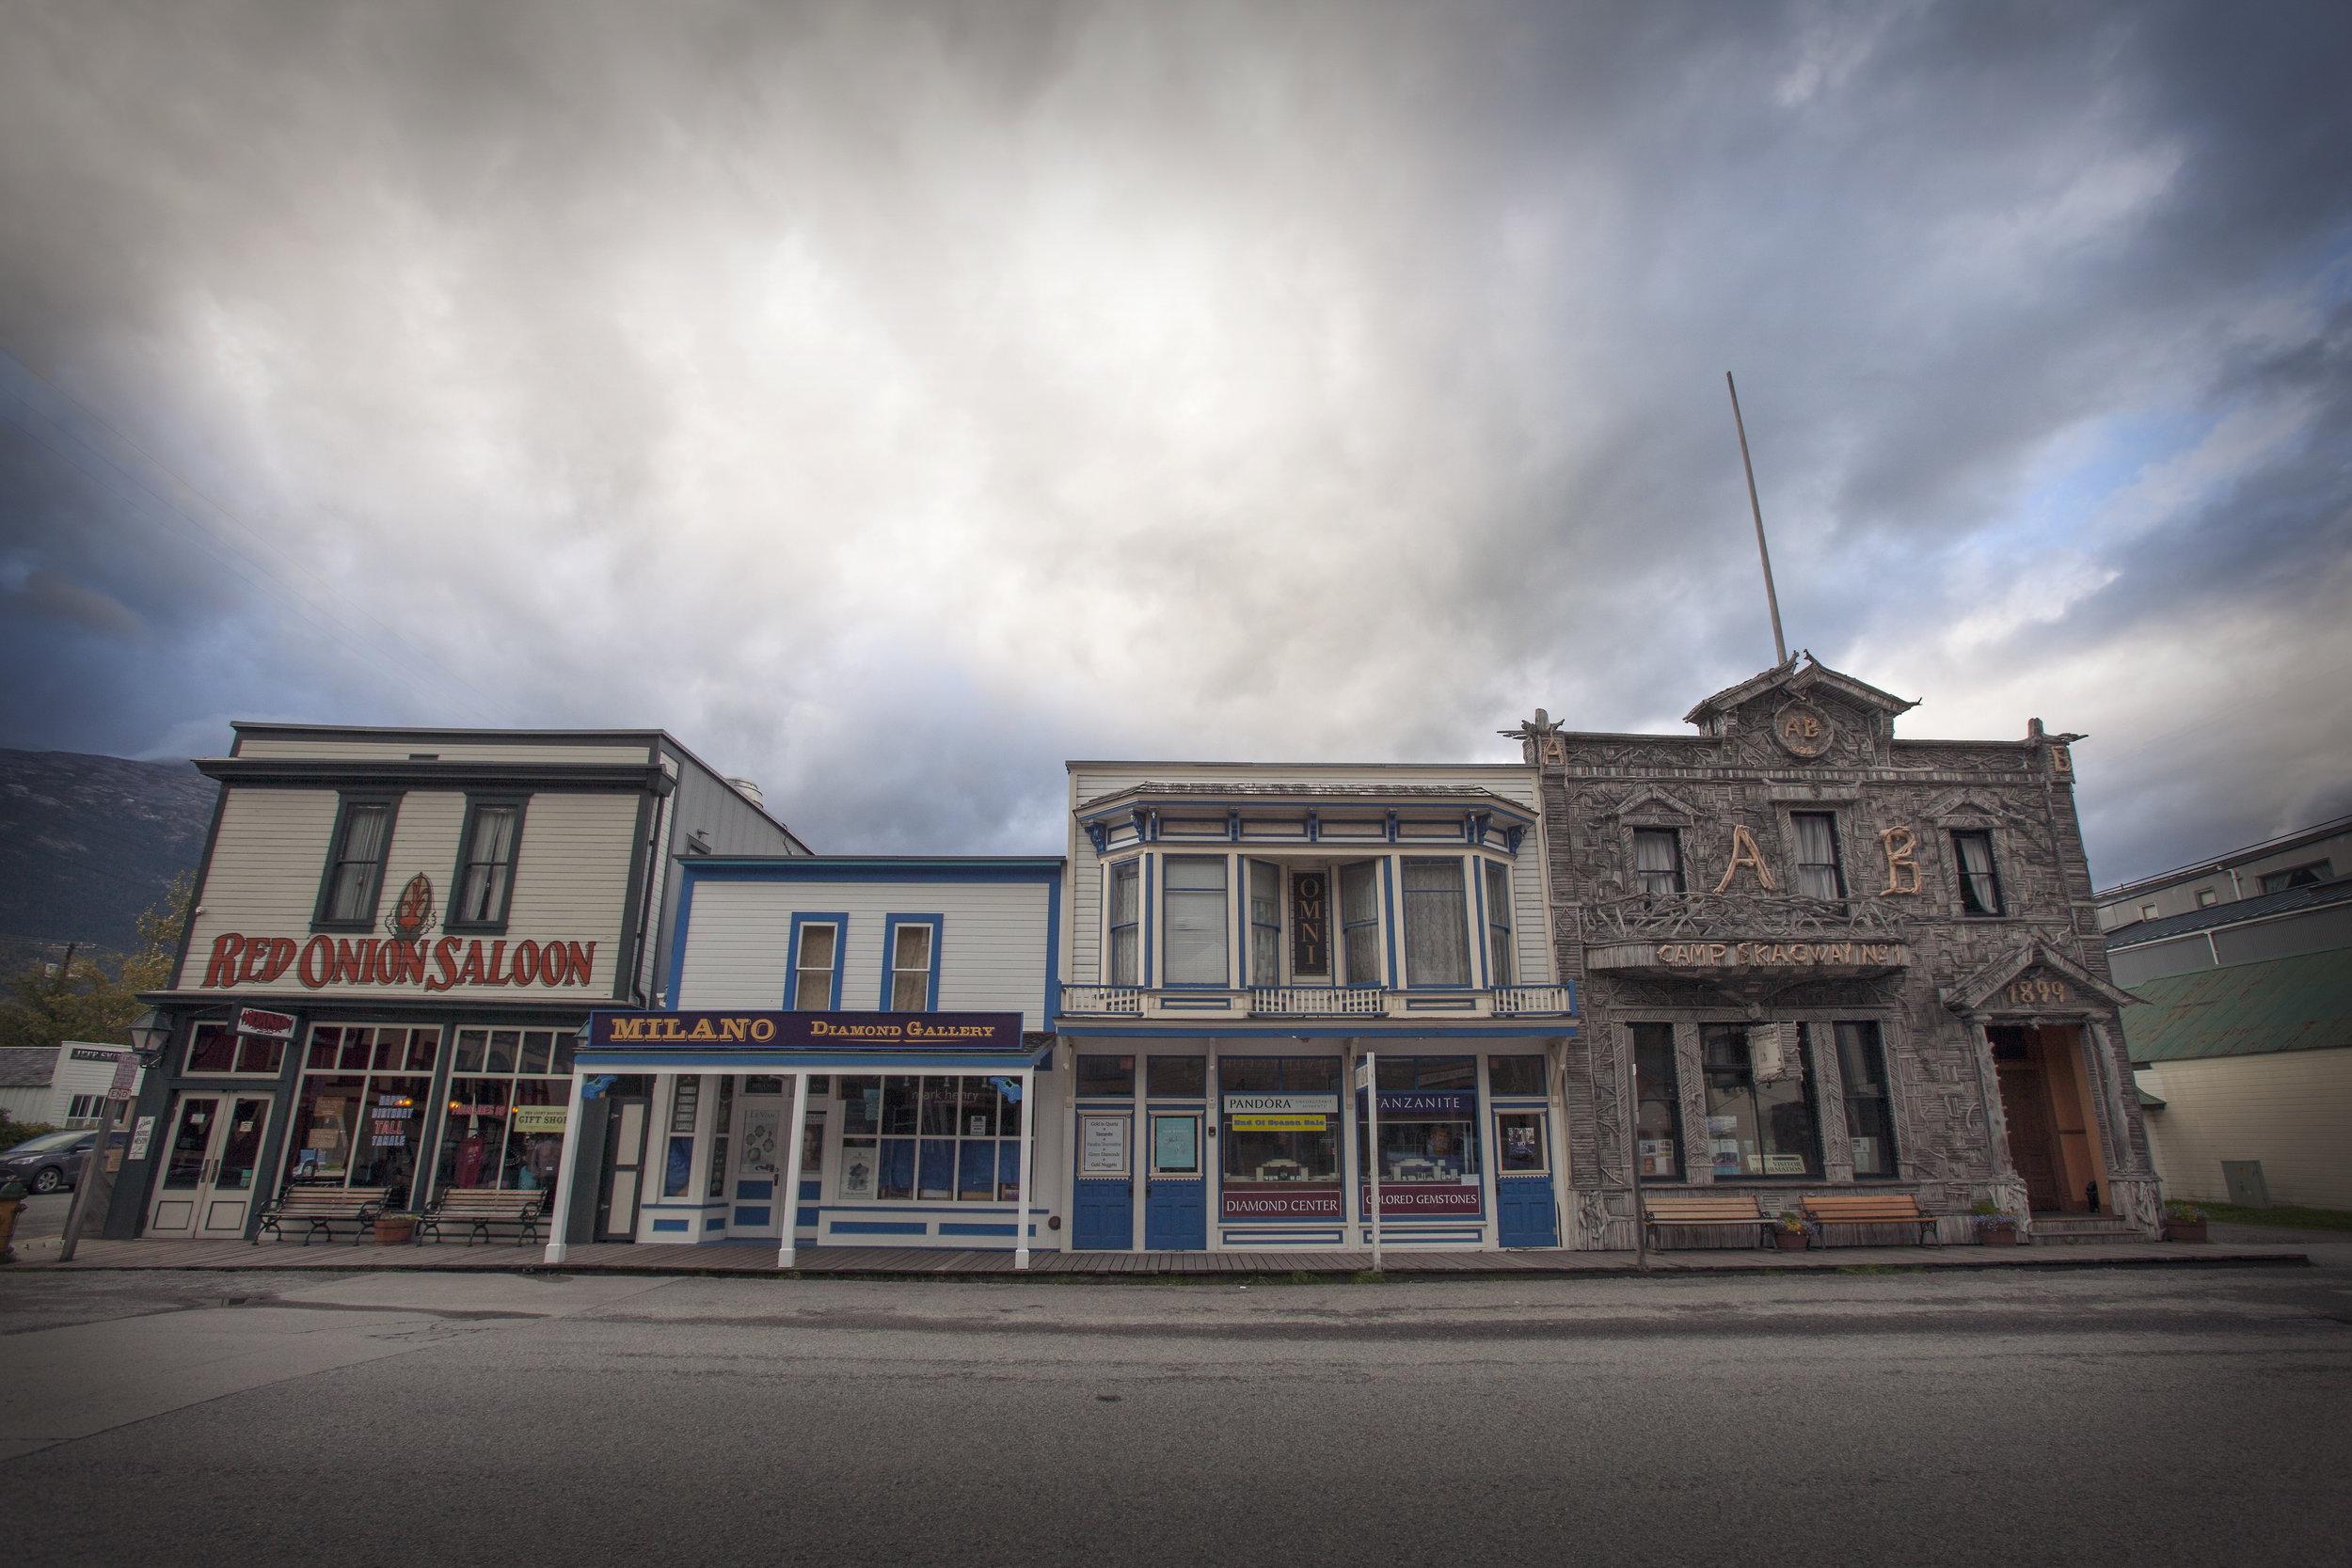 Main Street, Skagway - Across the Blue Planet